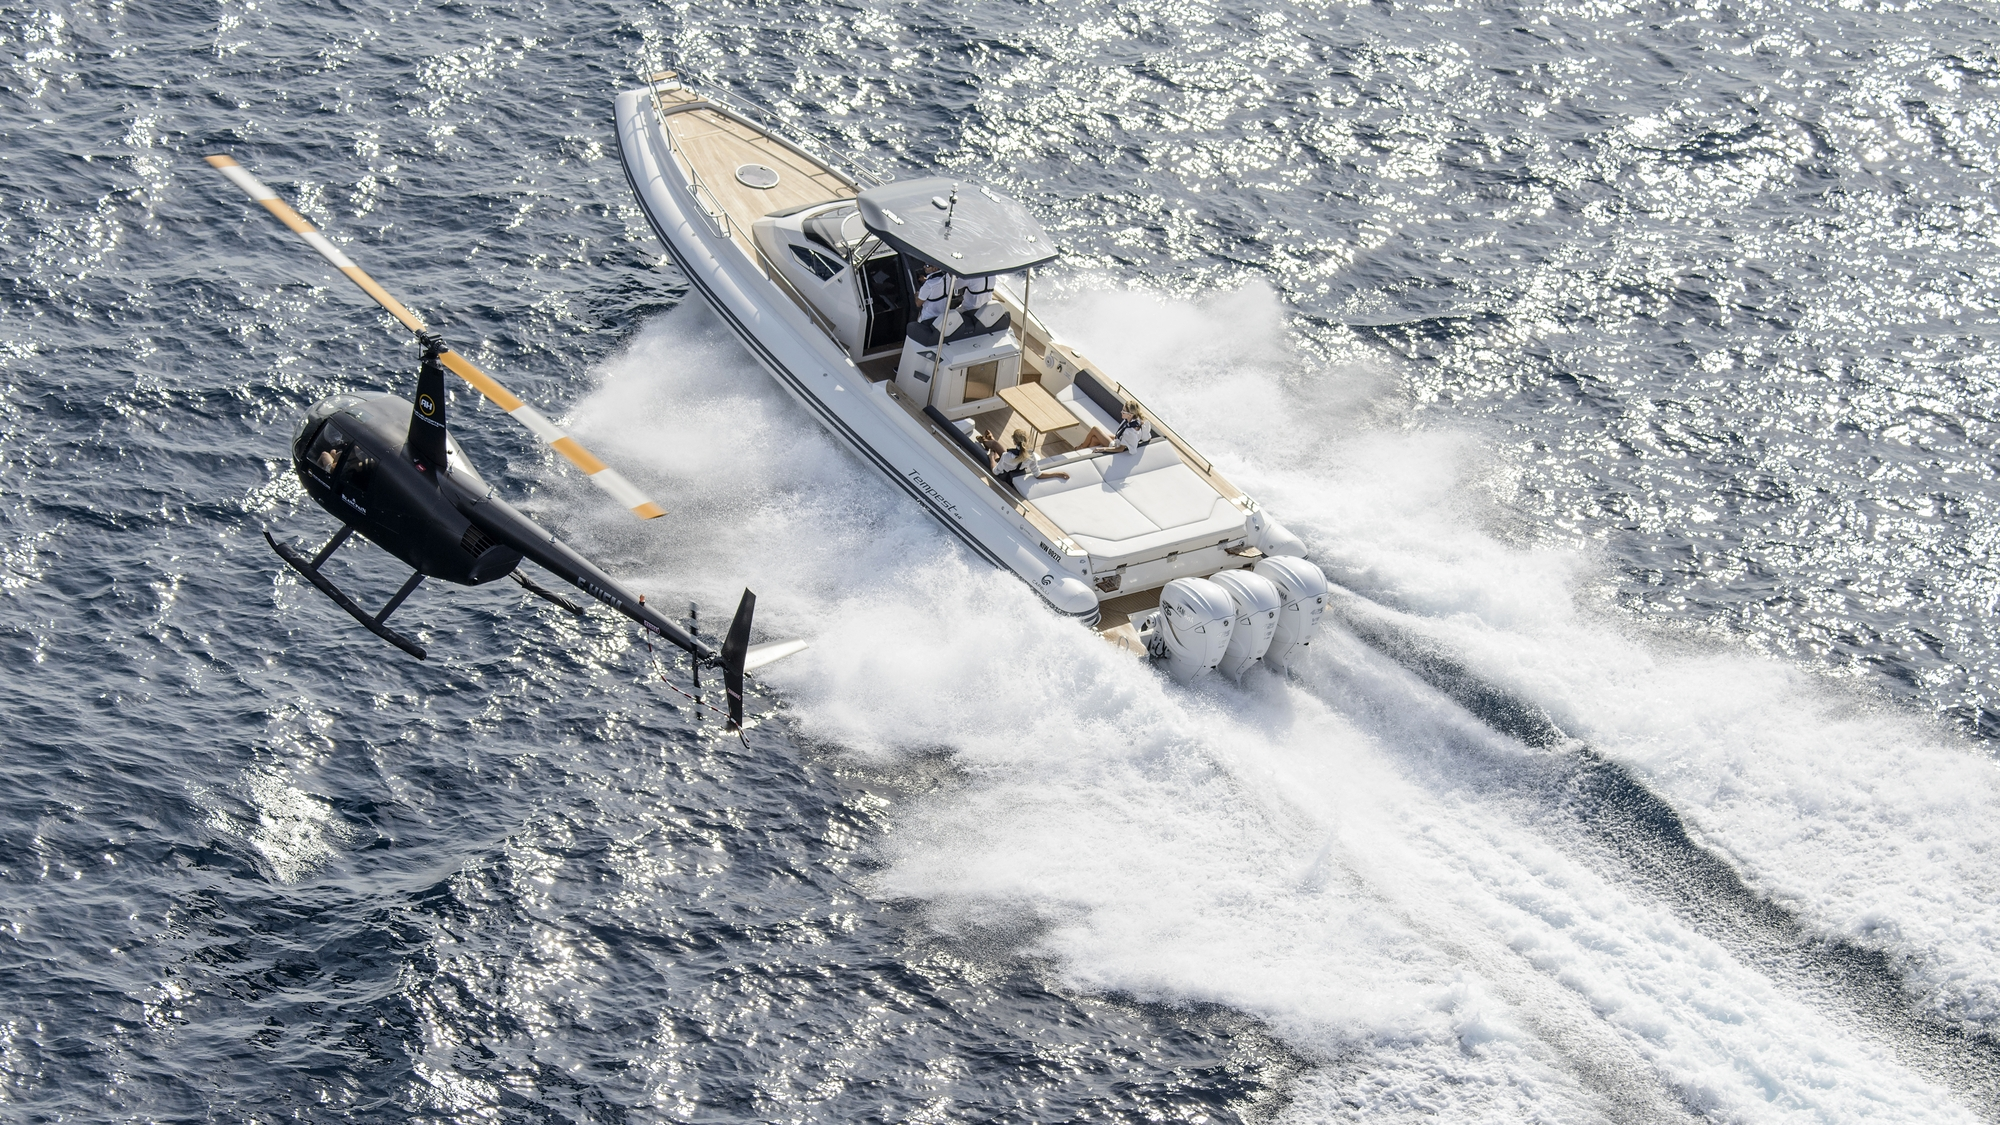 2018-Yamaha-V8-XTO-EU-Pearl_White-Action